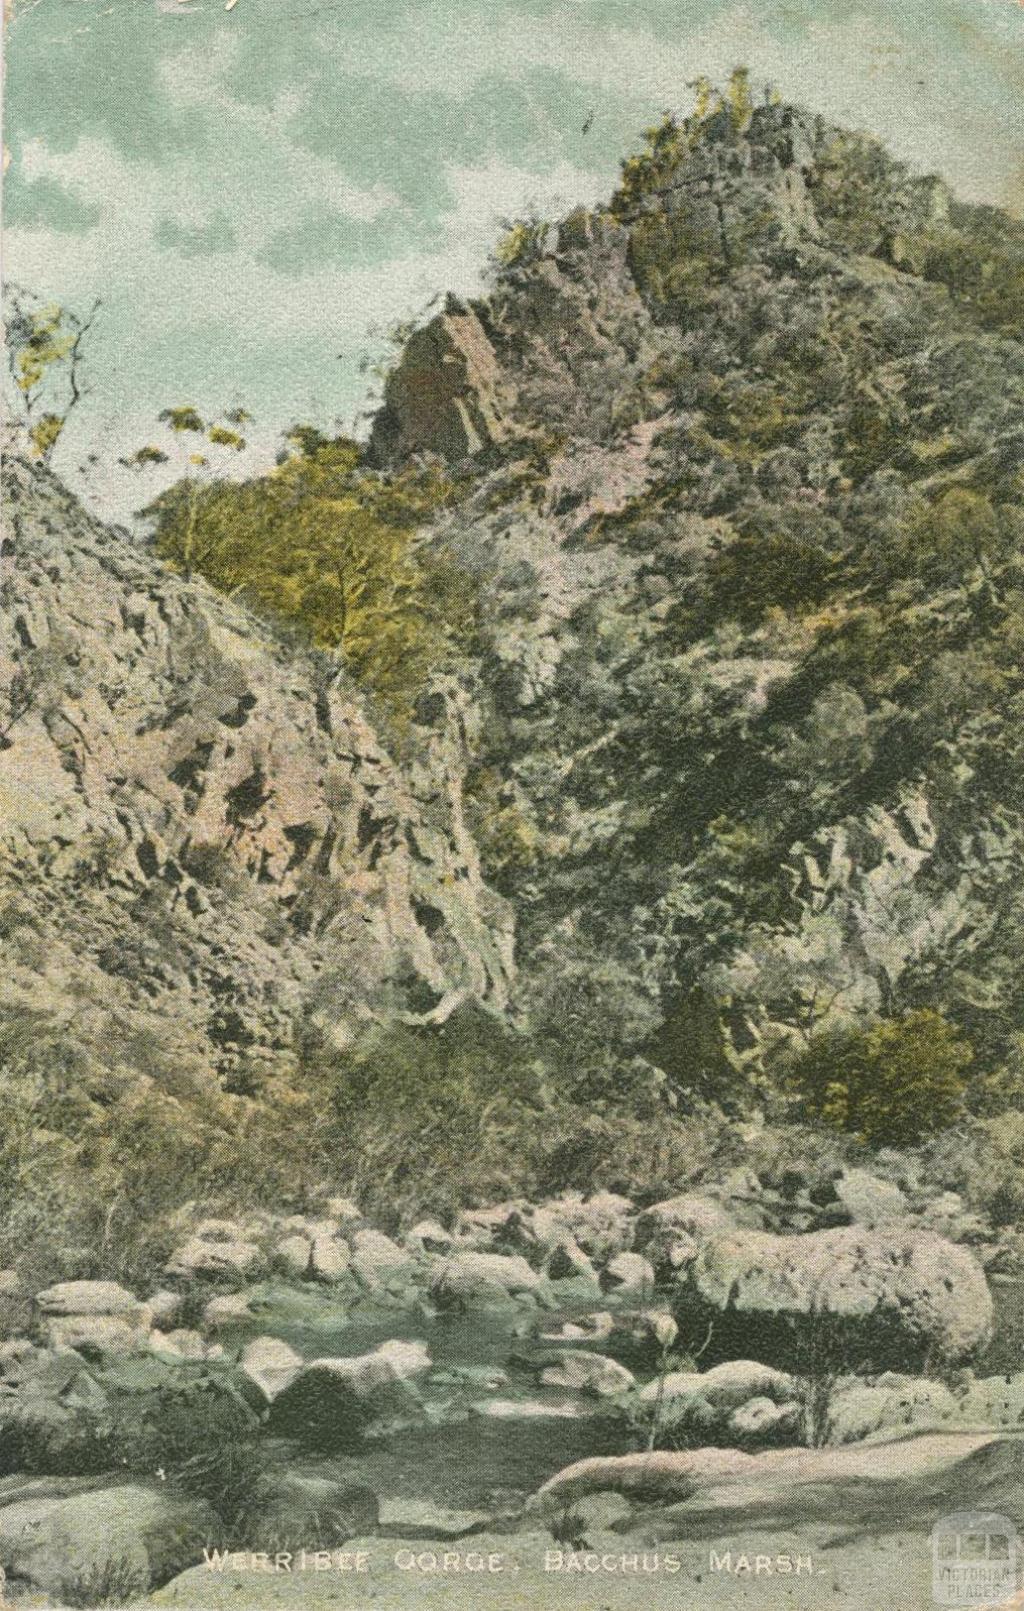 Werribee Gorge, Bacchus Marsh, 1908